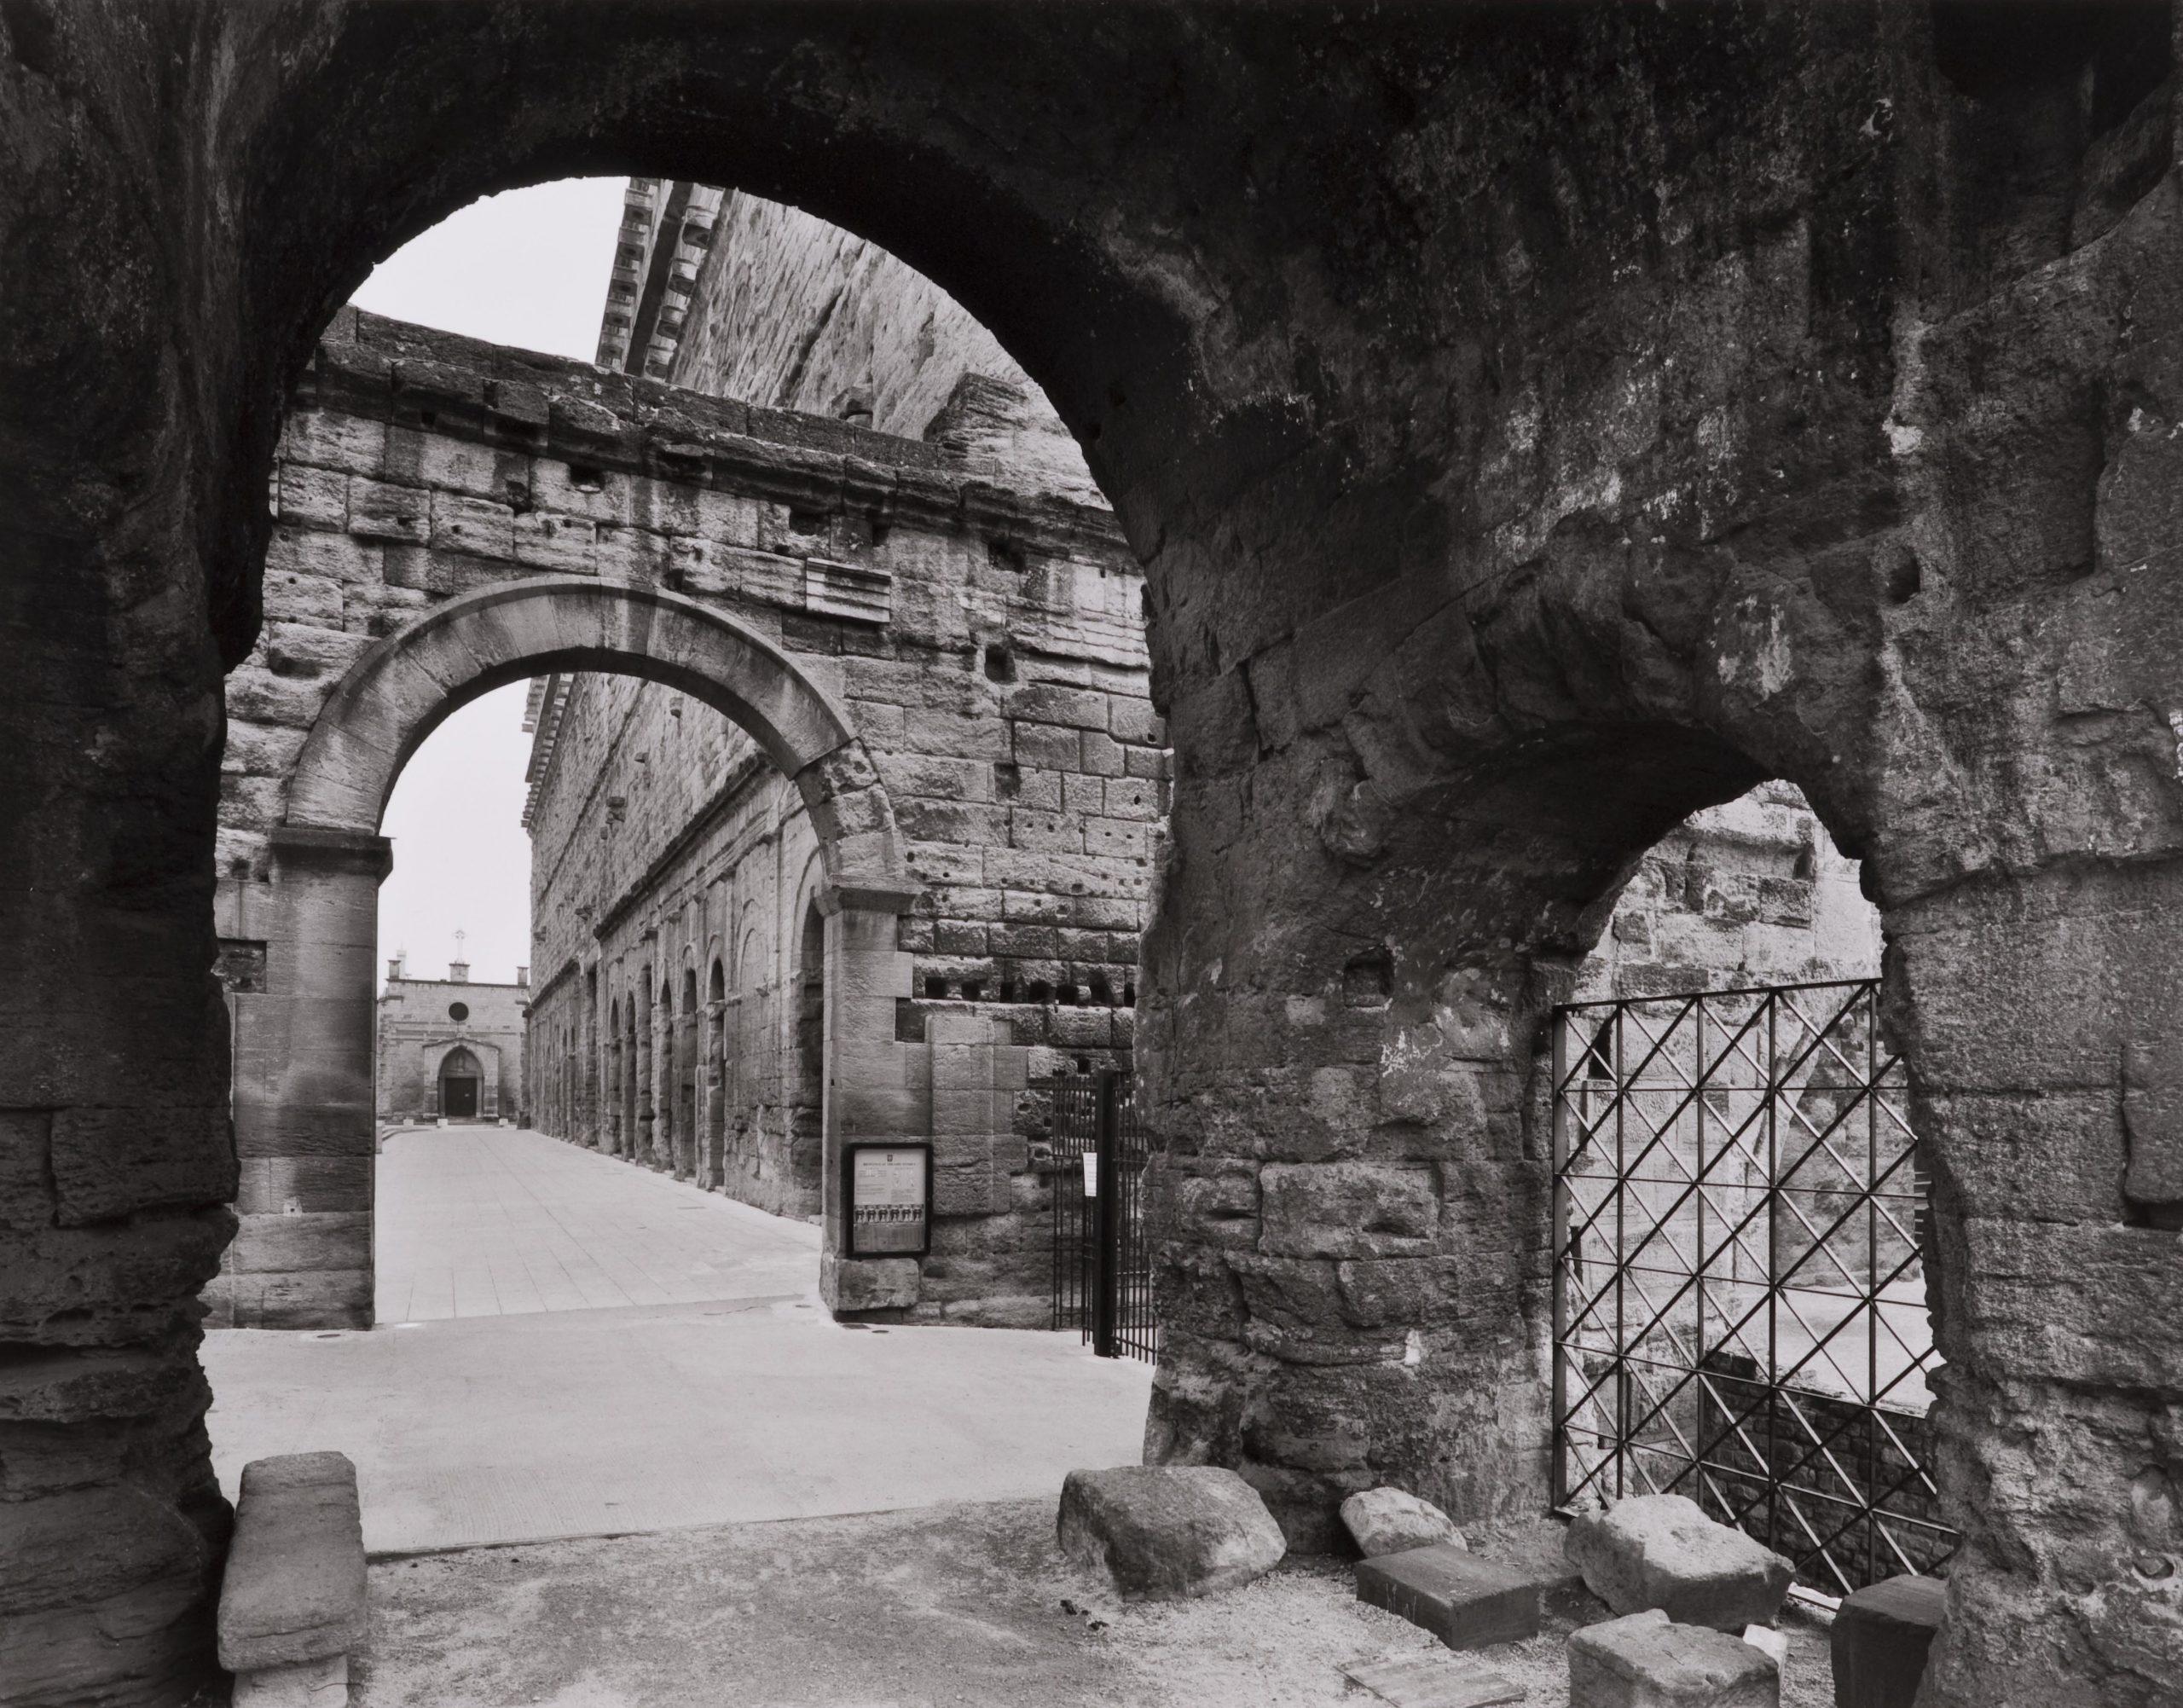 Basilico, Gabriele 21